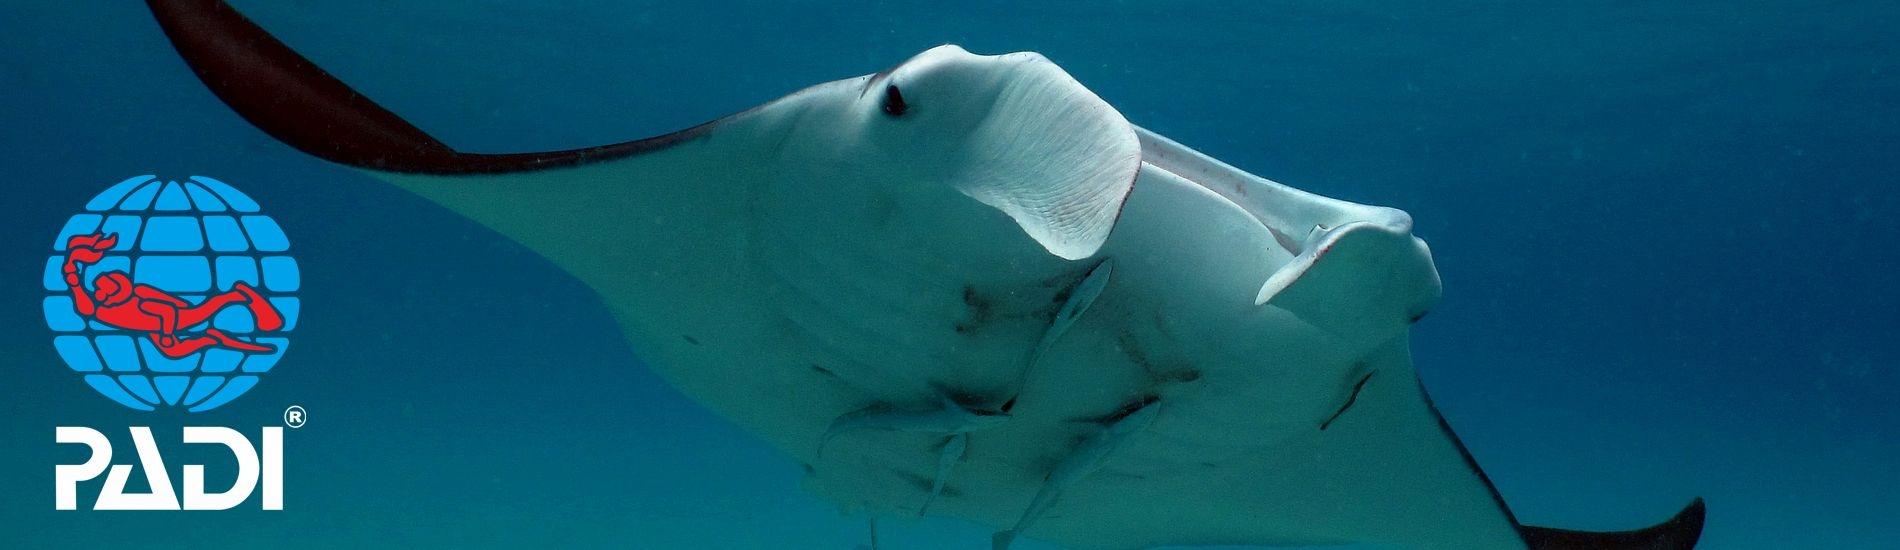 The Manta Underwater Room Rates